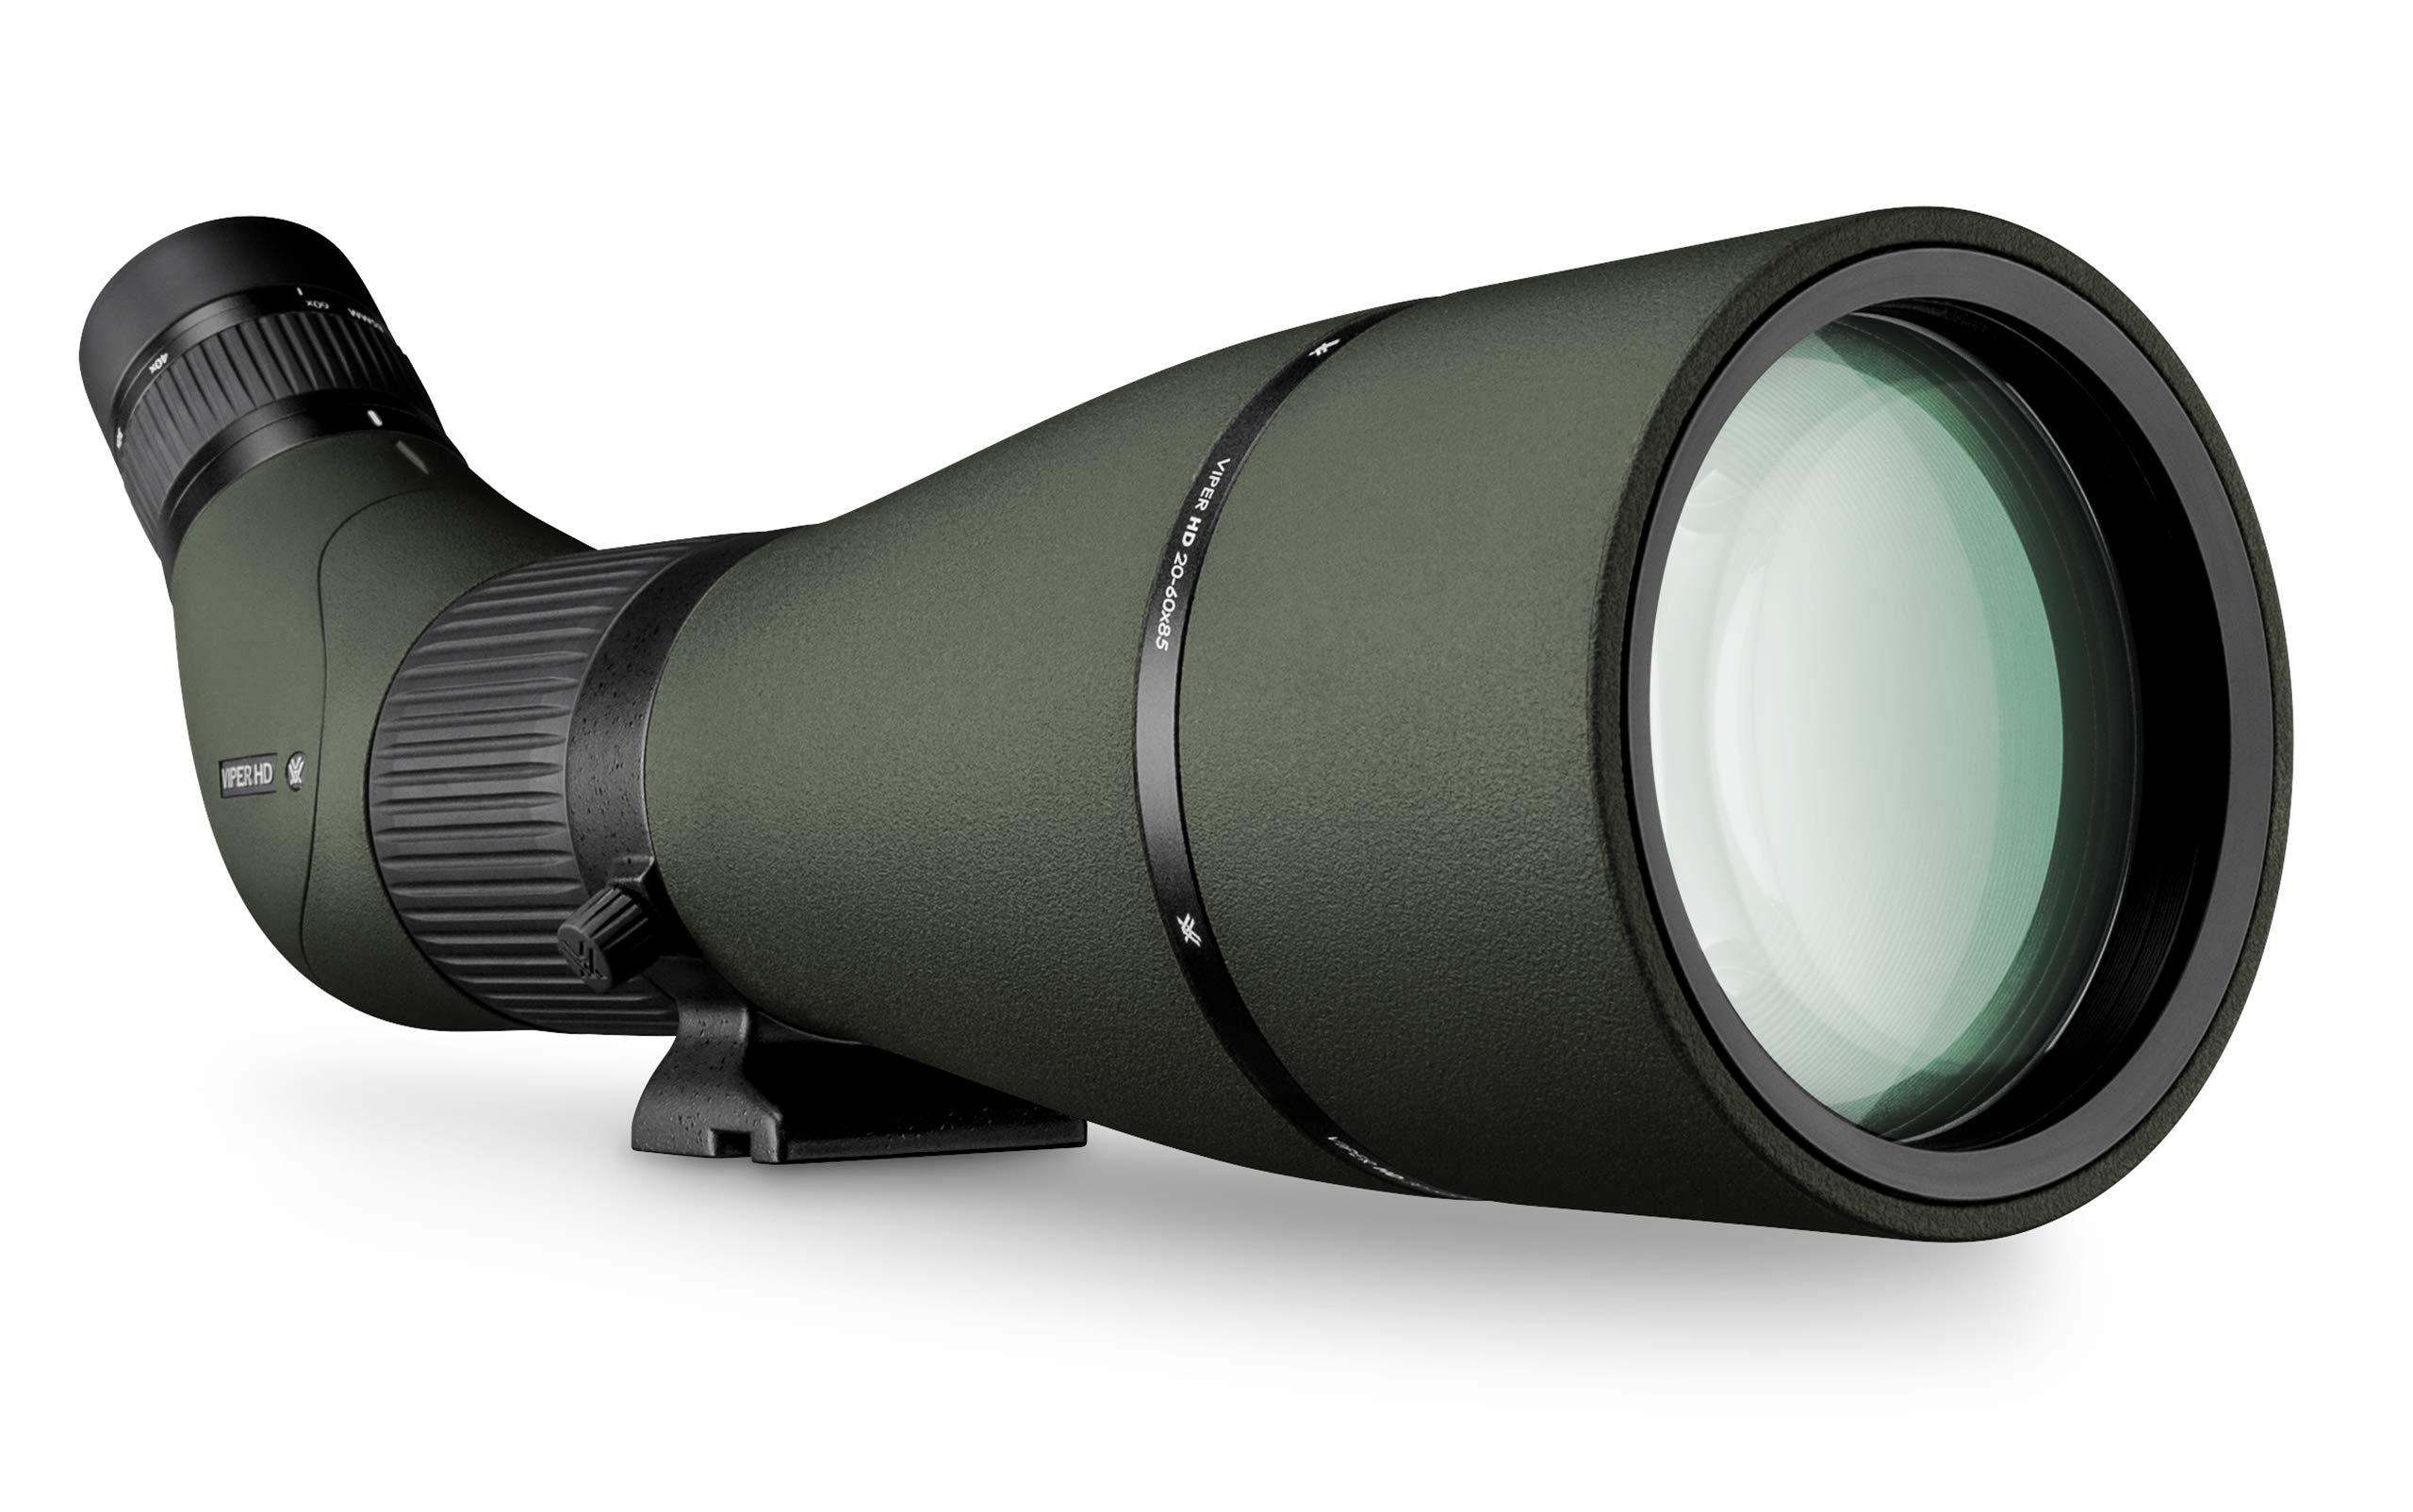 Vortex Optics Viper HD Spotting Scope 20-60x85 Angled by Vortex Optics